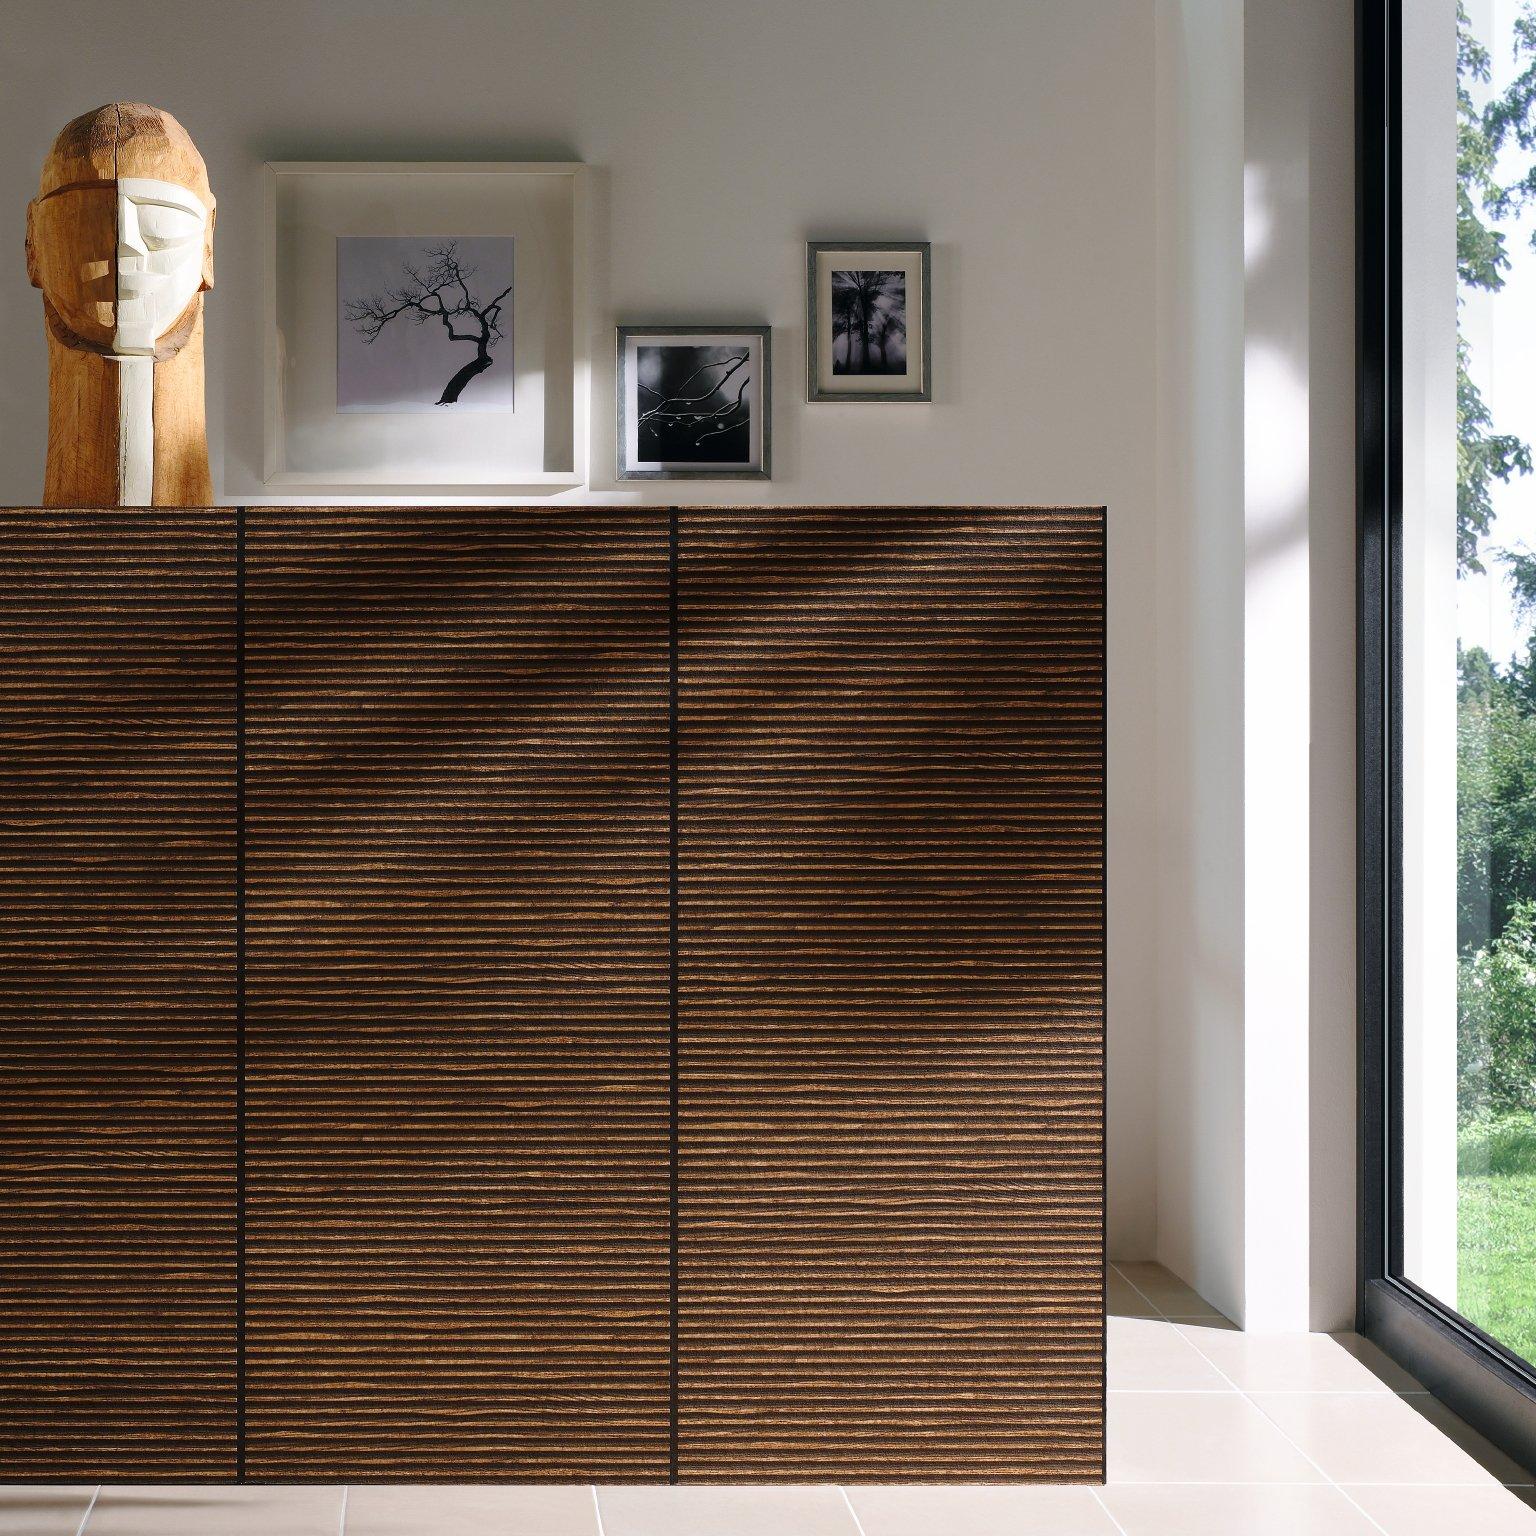 Tapete Holzoptik - Gestaltungstipps